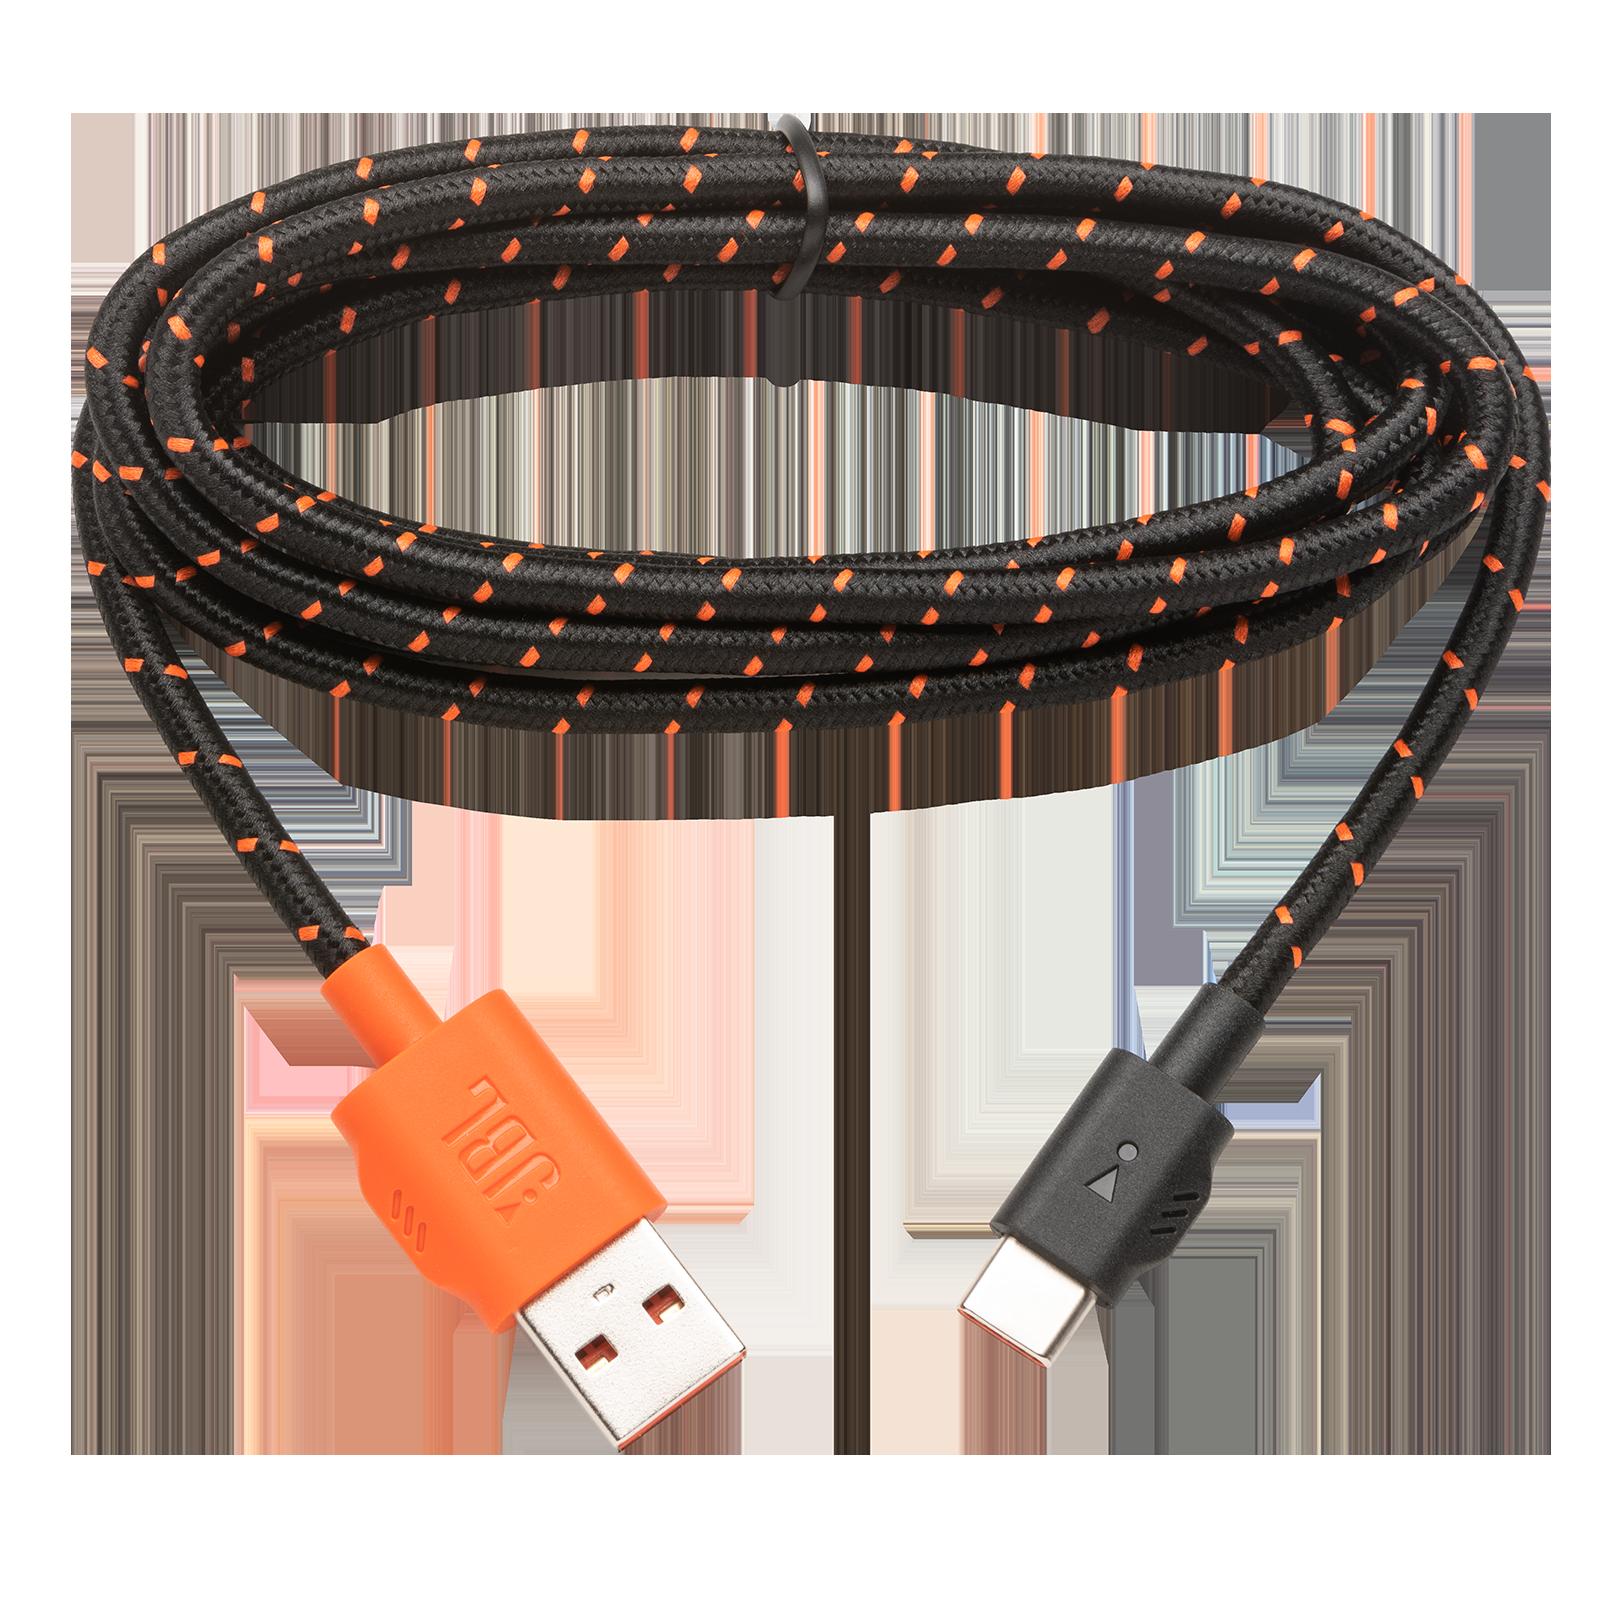 JBL USB Adapter cable Quantum 600 - Black - USB adapter cable, 150cm - Hero